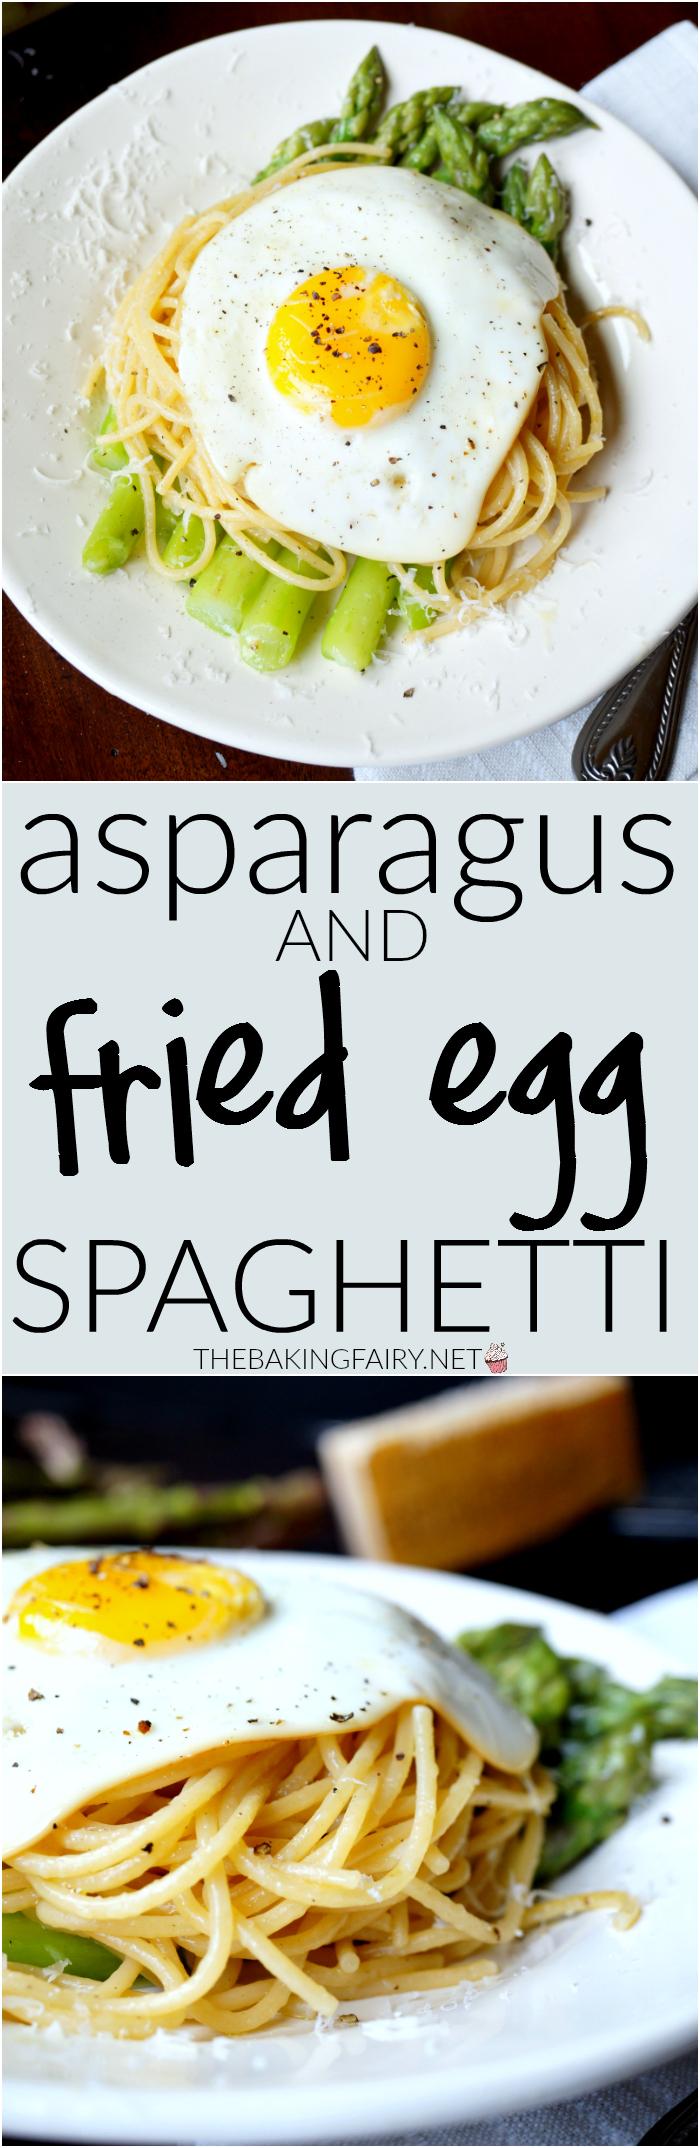 asparagus & fried egg spaghetti   The Baking Fairy